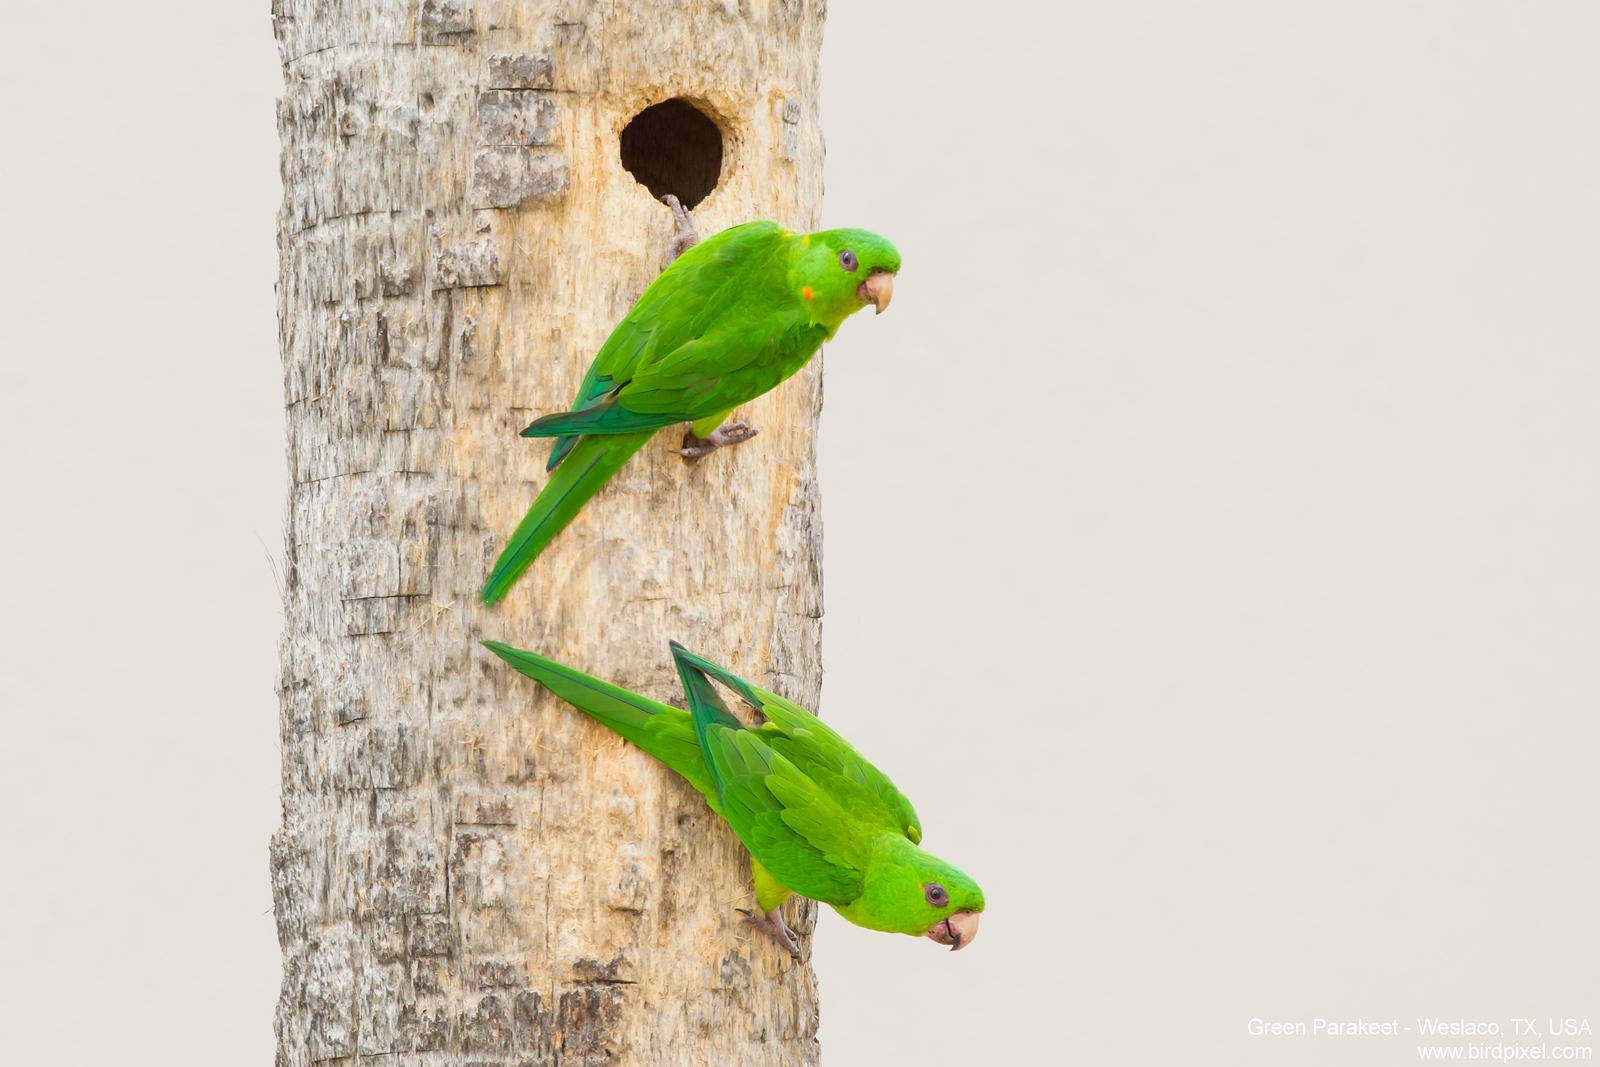 Green Parakeet - USA